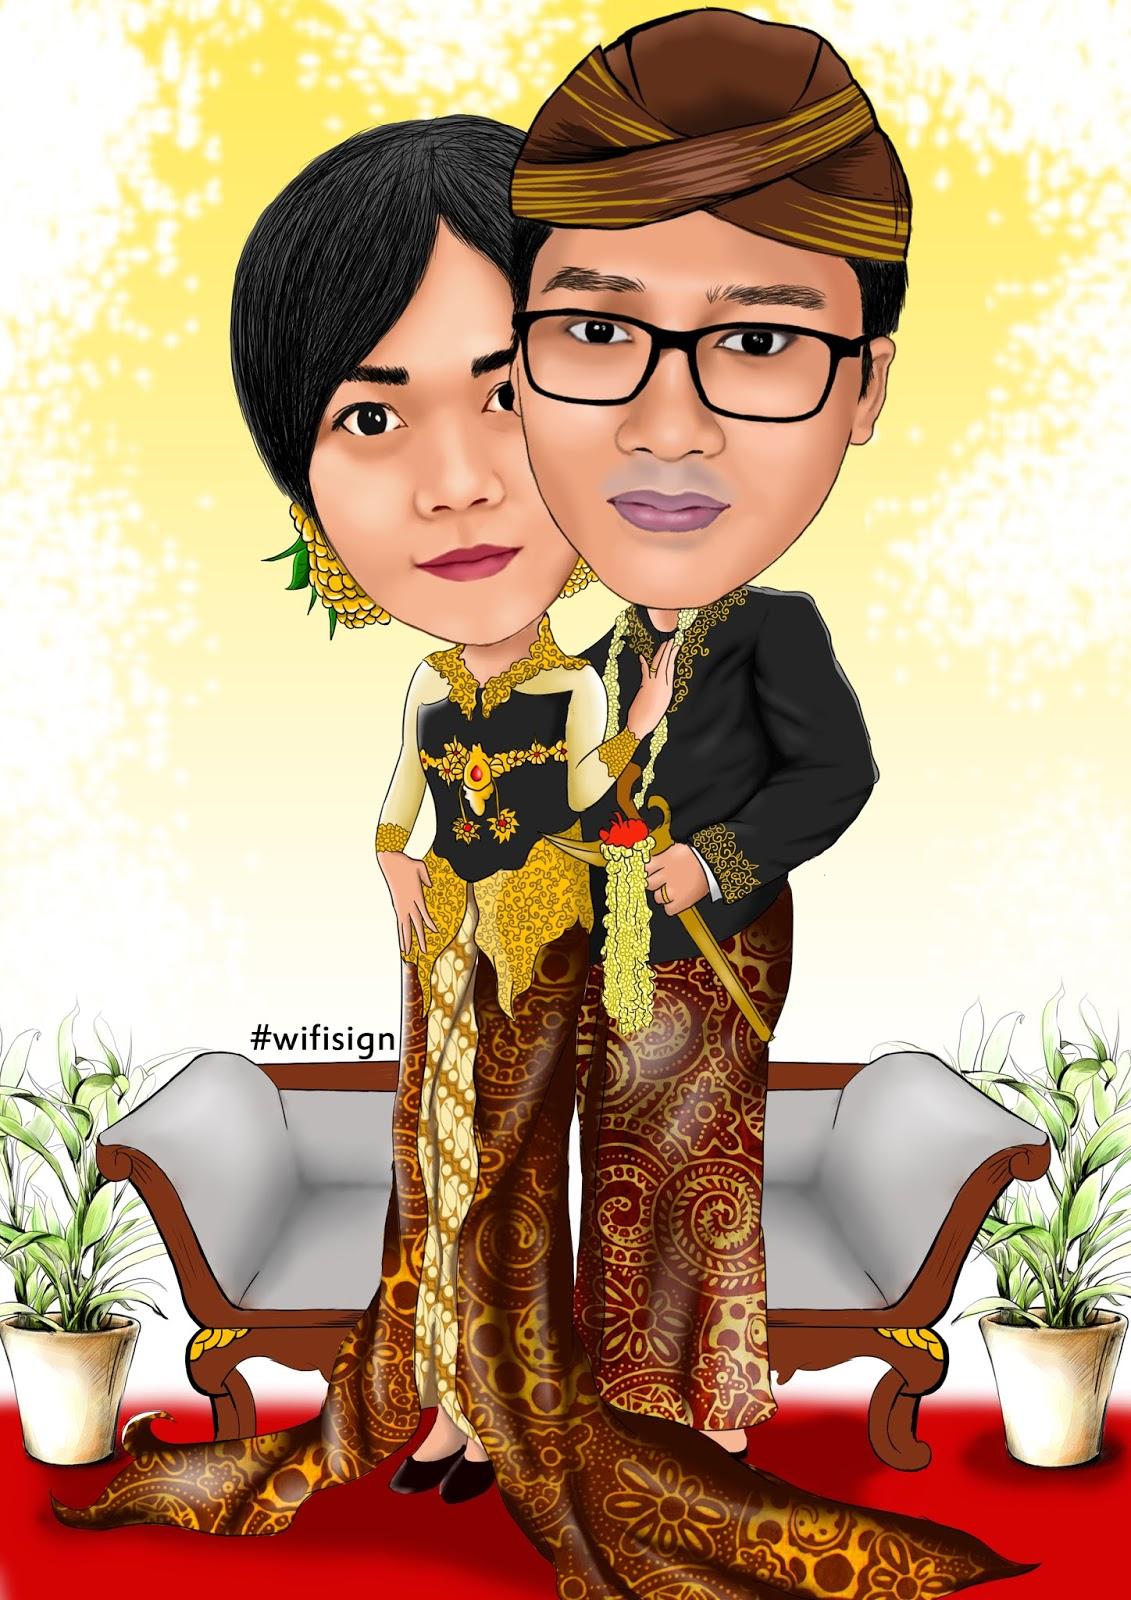 Gambar Kartun Pernikahan Adat Jawa